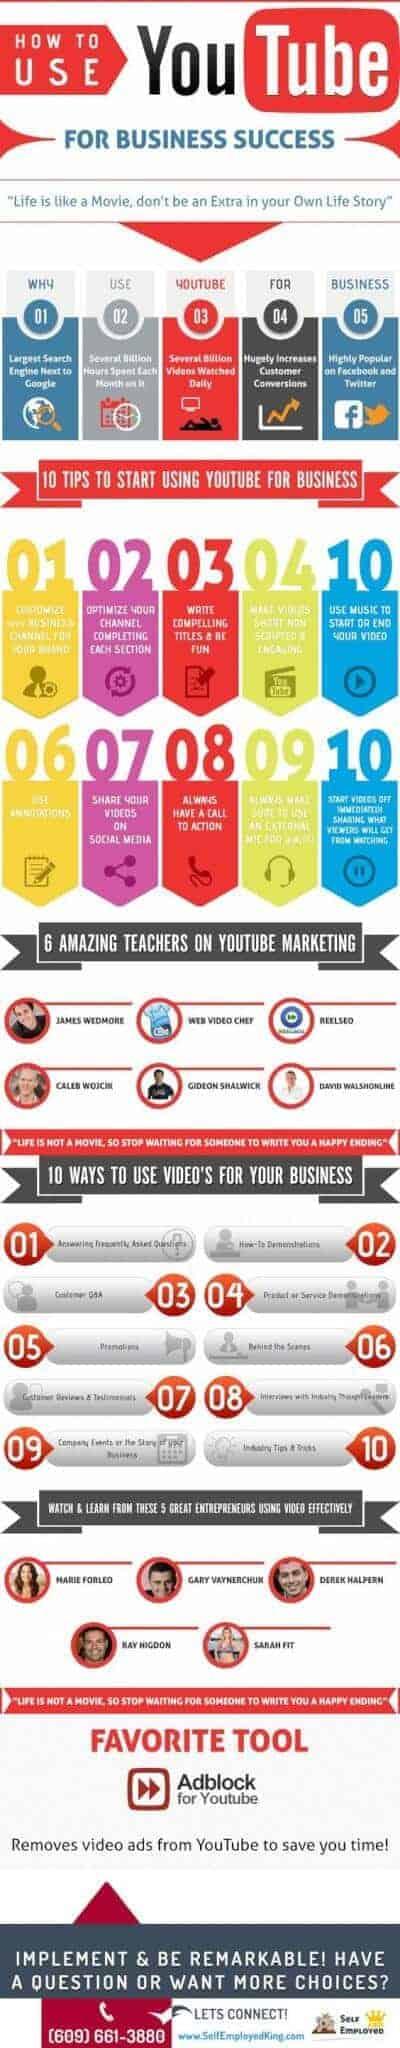 saber-youtube-negocios-infografia